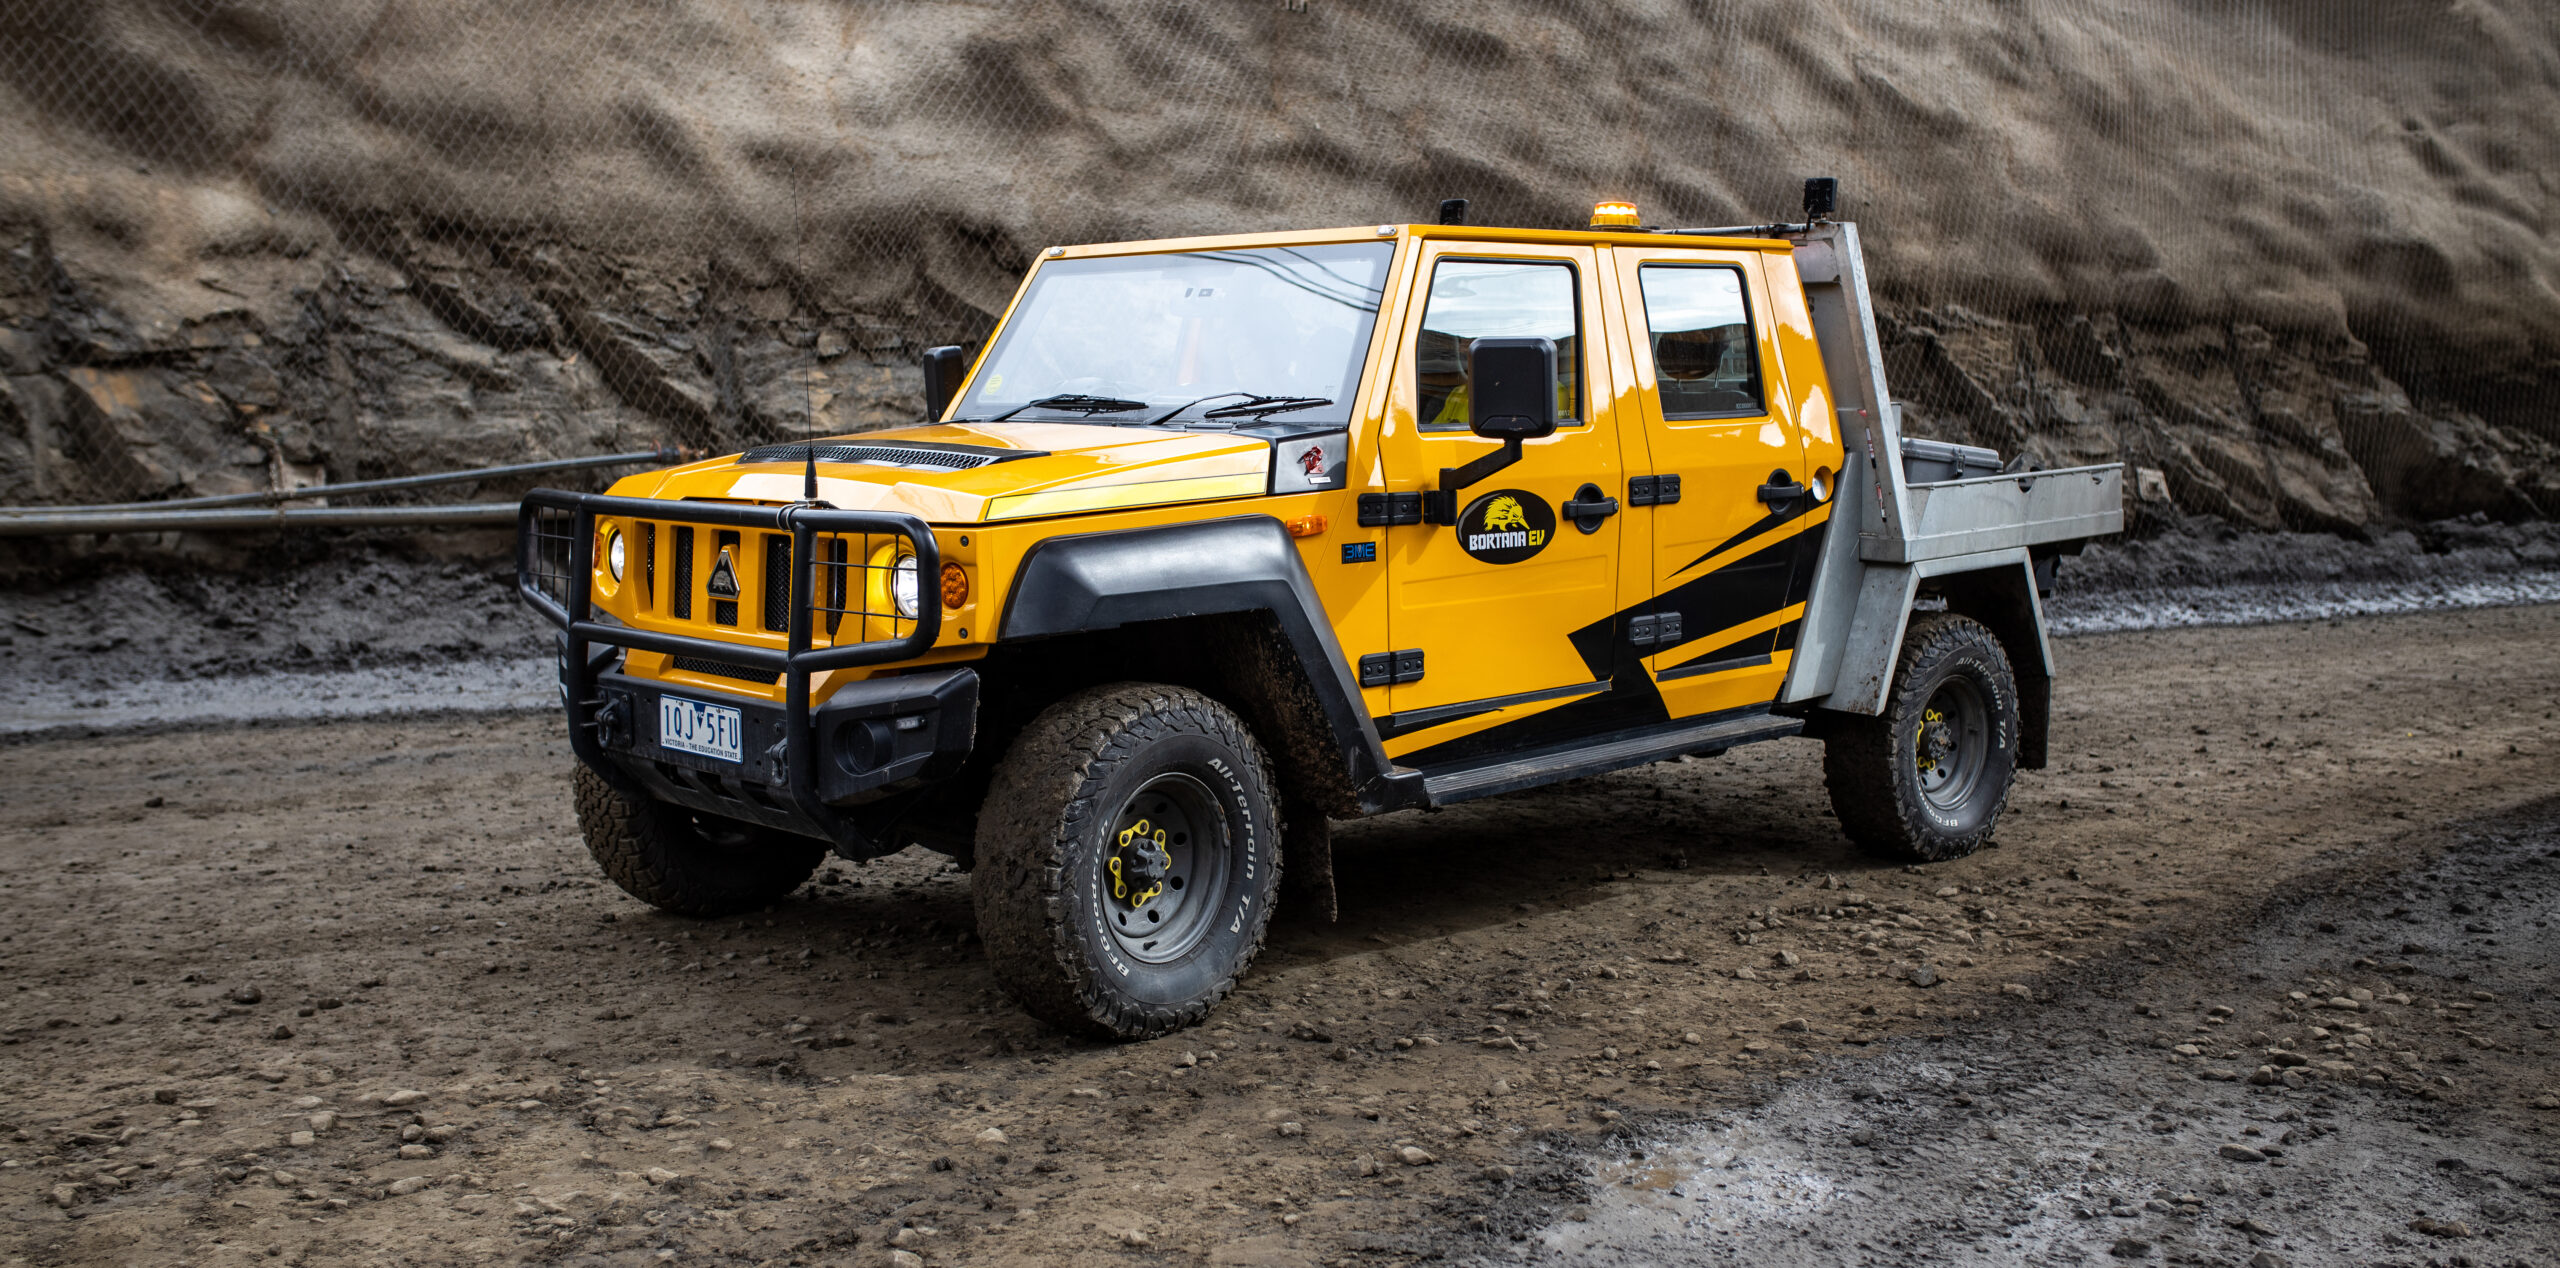 Electric vehicle trial success at IGO's Nova mine • 0O6A0388 edit scaled